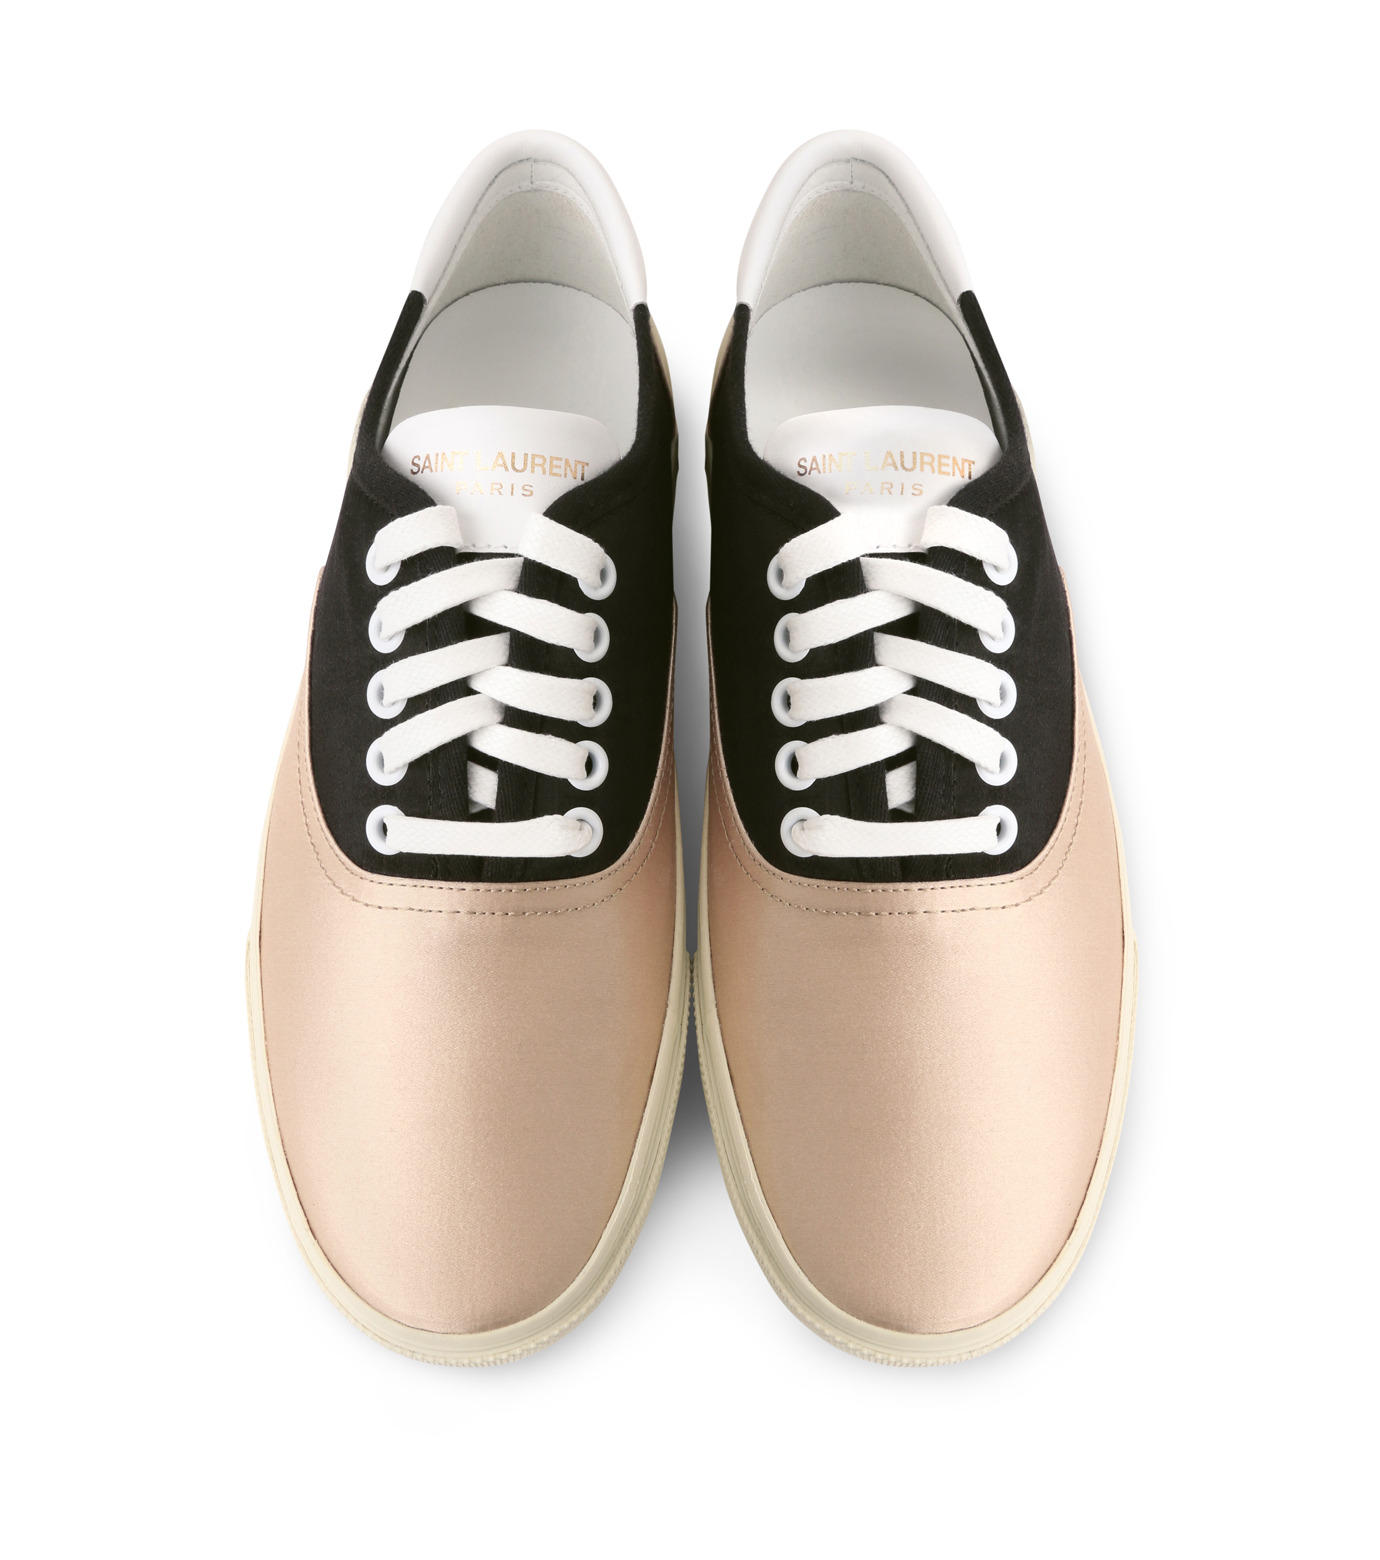 SAINT LAURENT(サンローラン)のSkate Sneaker Lace Up Satin-BEIGE(スニーカー/sneaker)-345062-F1430-52 拡大詳細画像4